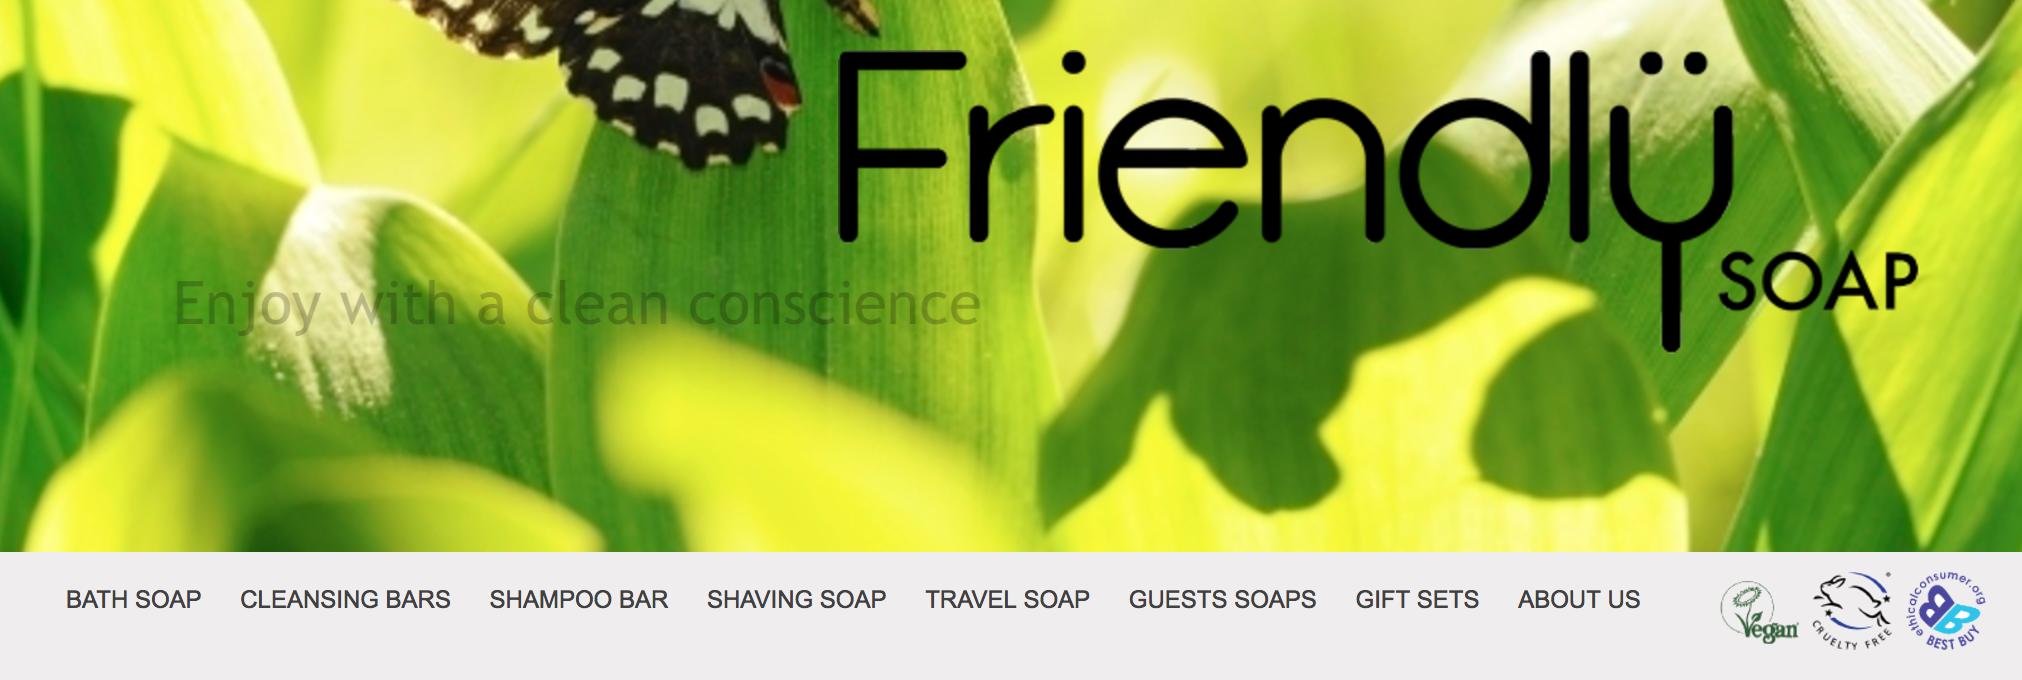 Friendly Soap cruelty-free logo